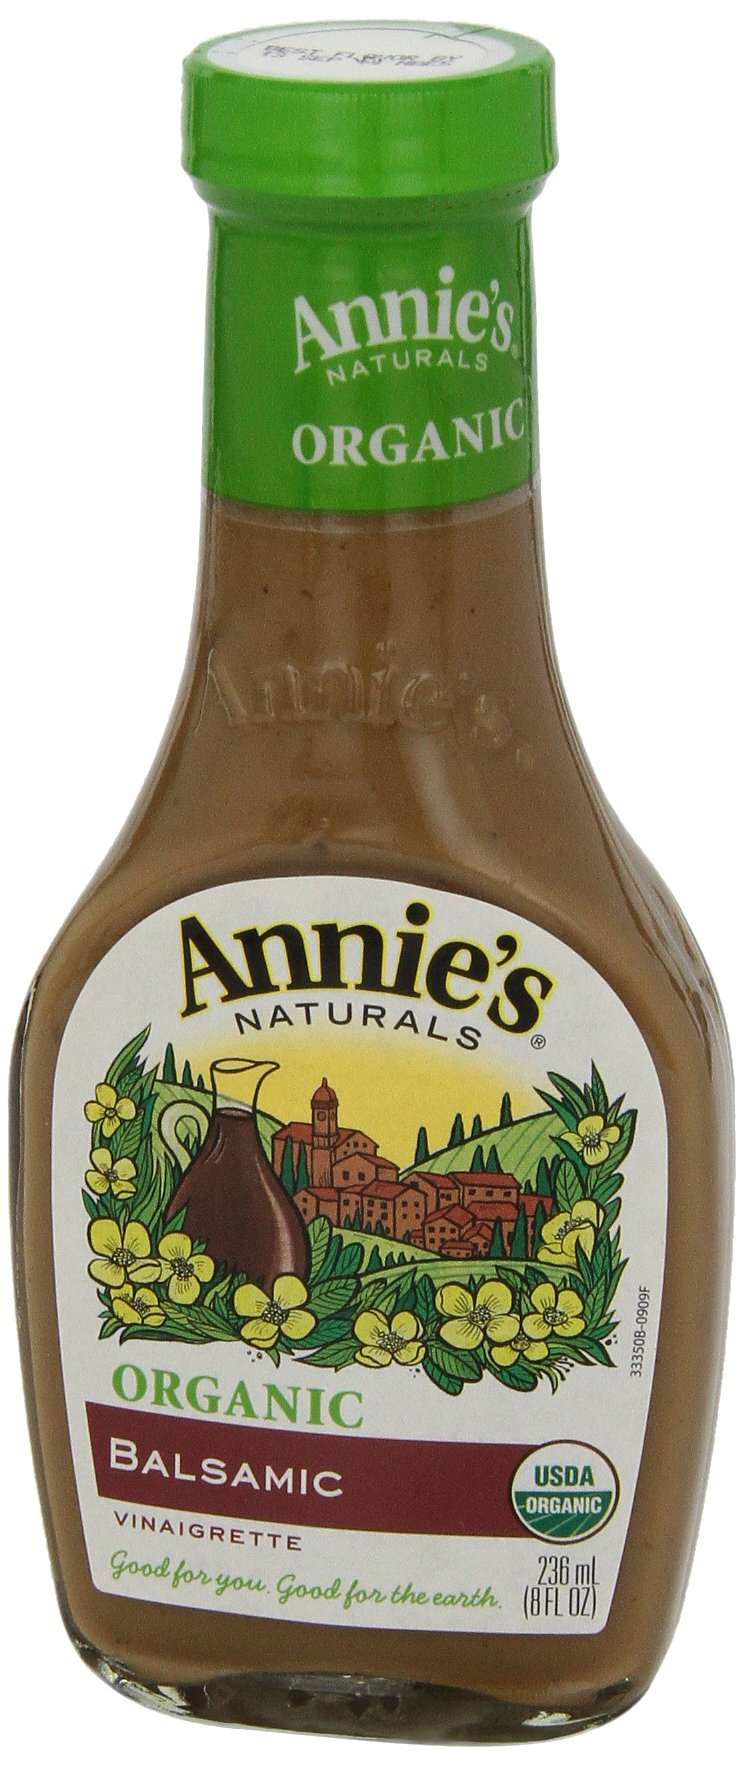 Annie's Organic Gluten Free Balsamic Vinaigrette Dressing 8 fl oz Bottle by Annie's Homegrown (Image #5)